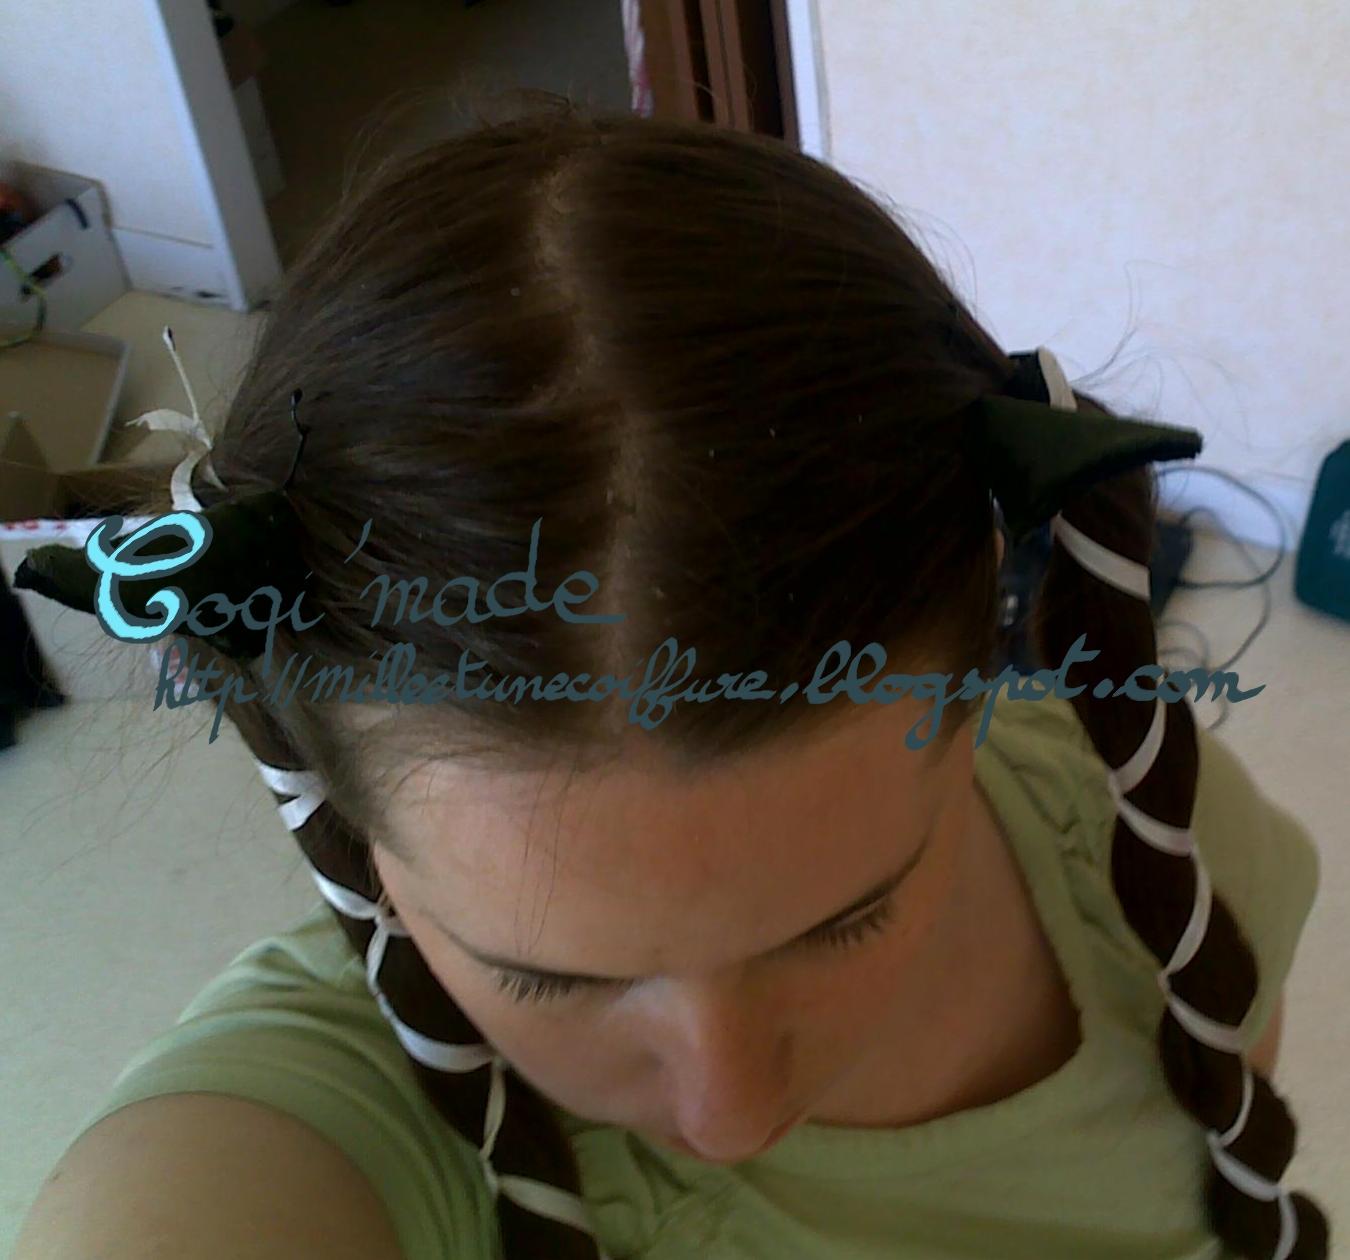 http://3.bp.blogspot.com/-w0FeDF1XT5U/Tc7bro8KBdI/AAAAAAAADUQ/HuYSSLxC5Nw/s1600/couette+de+chat+avec+ruban.jpg